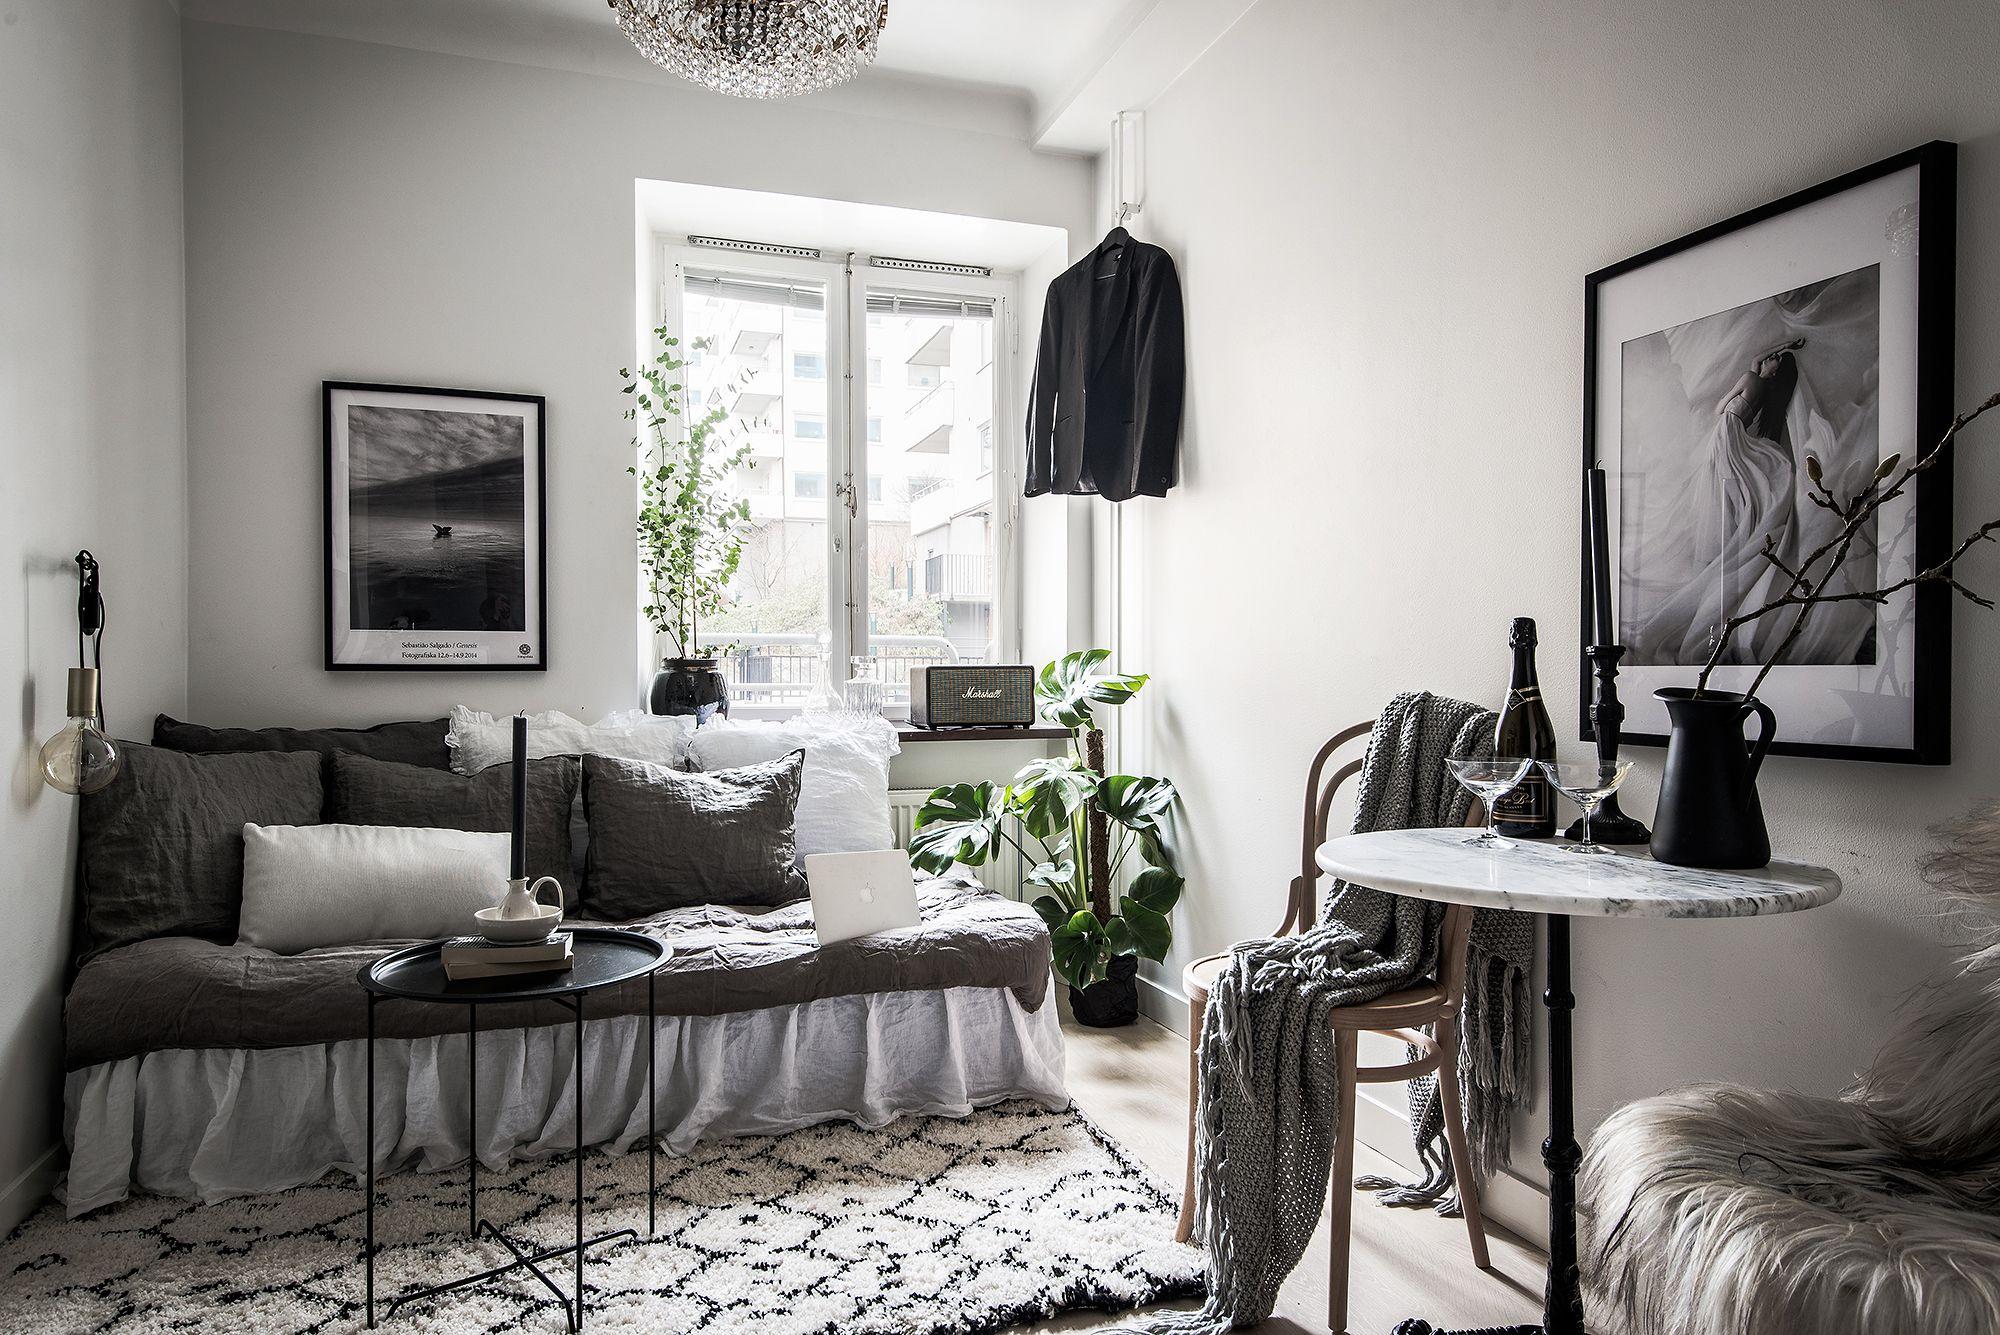 Pin By Emma Kjellander On Home Studio Apartment Decorating Small Apartment Decorating Apartment Design